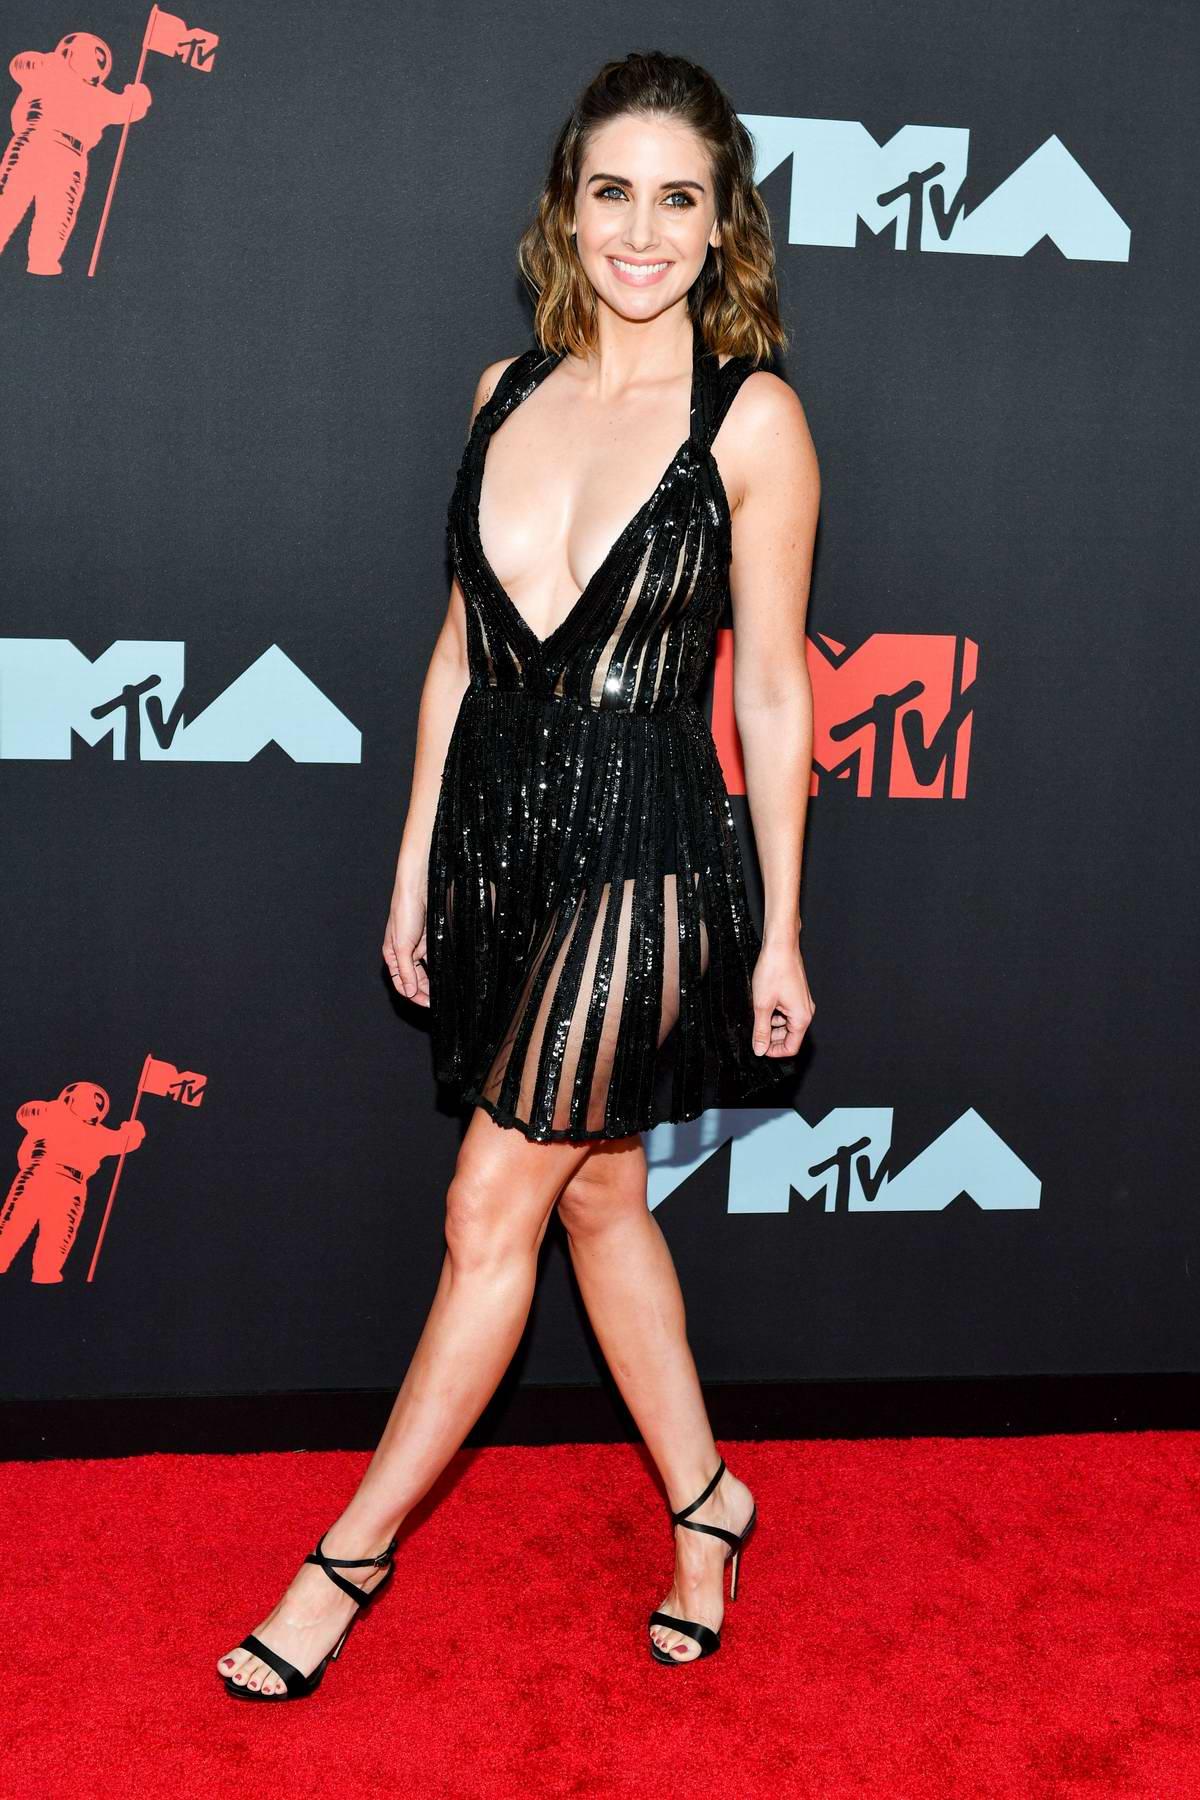 Alison Brie Nude LEAKED Pics & Sex Tape + Scenes